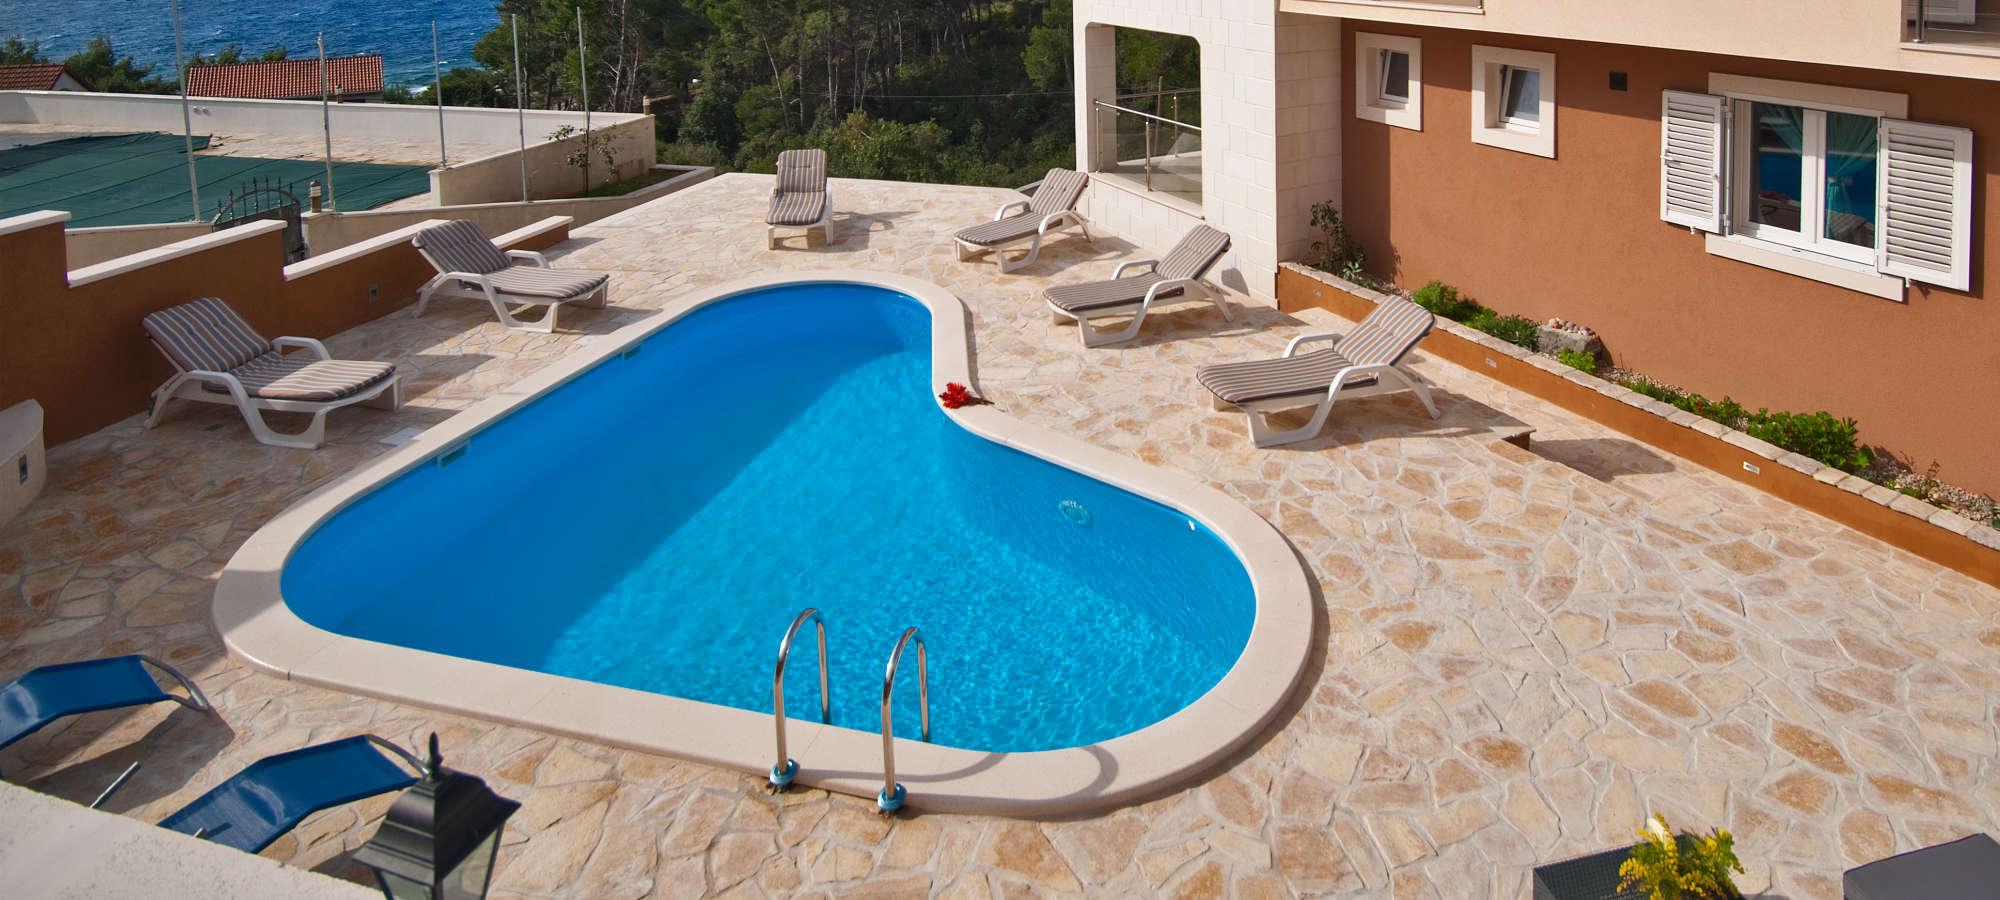 Dodatna oprema za bazene